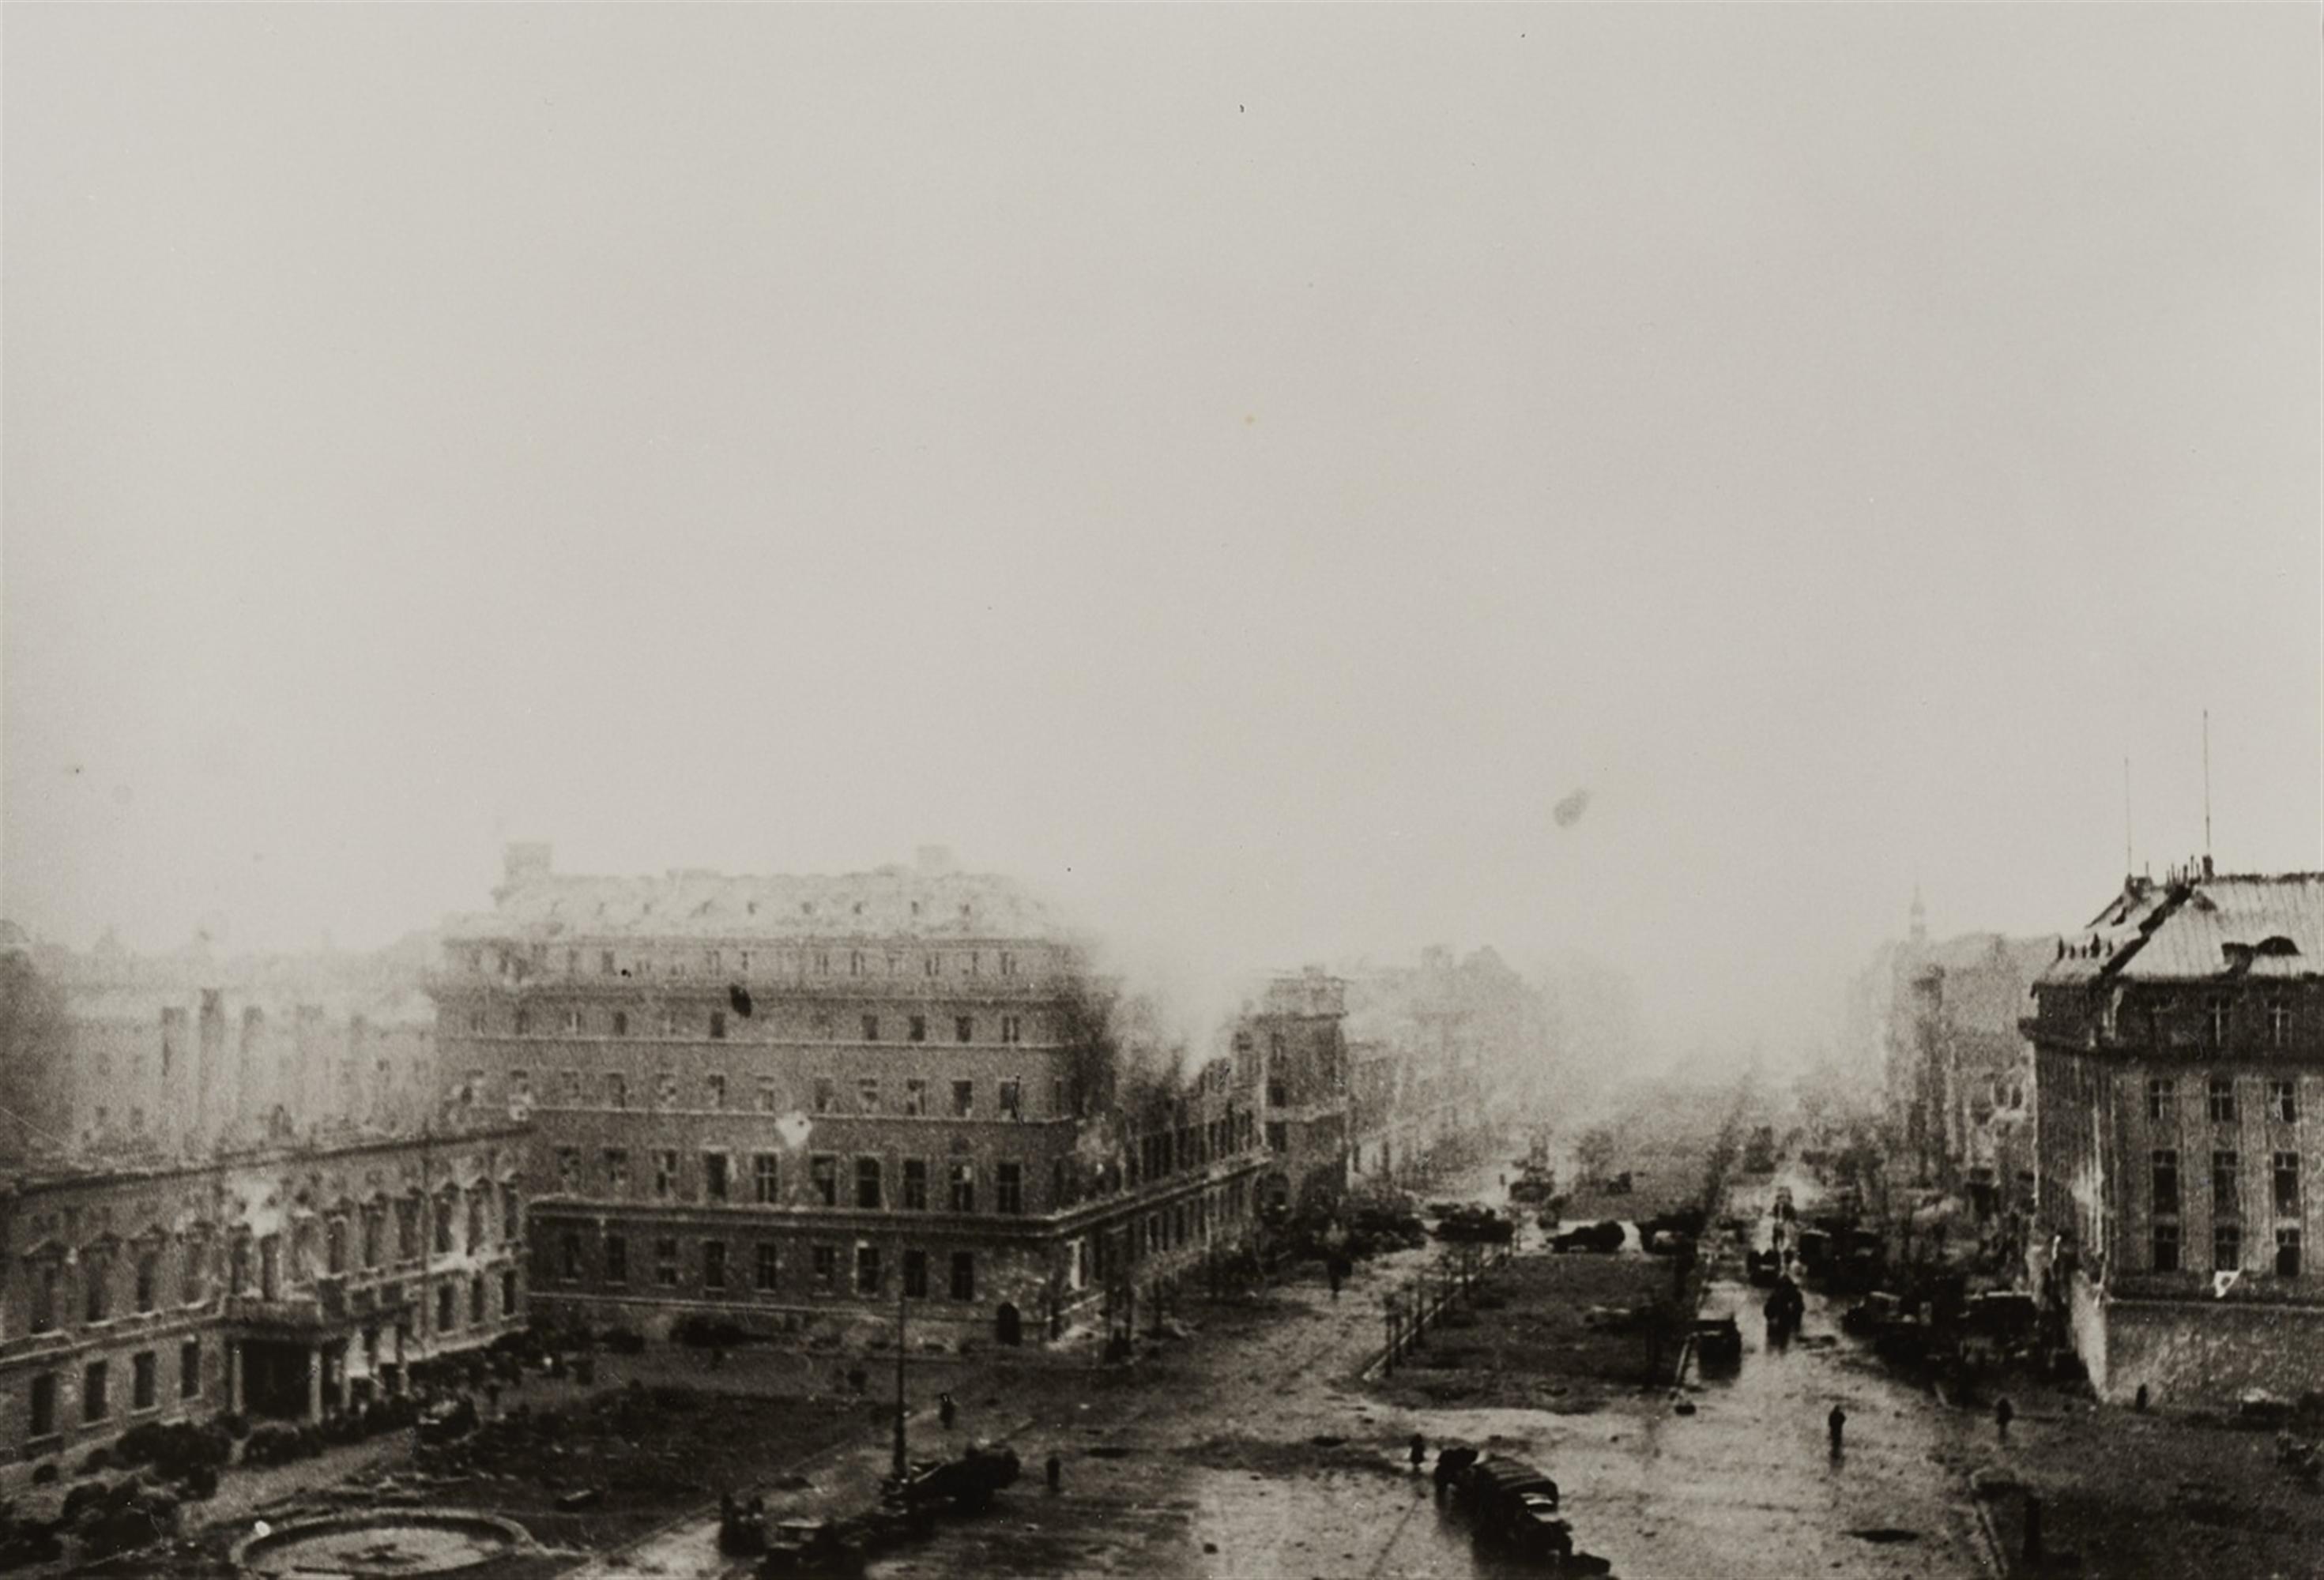 Yevgeni Chaldej<BR>Panorama des Pariser Platzes, Berlin - Image 3 of 3